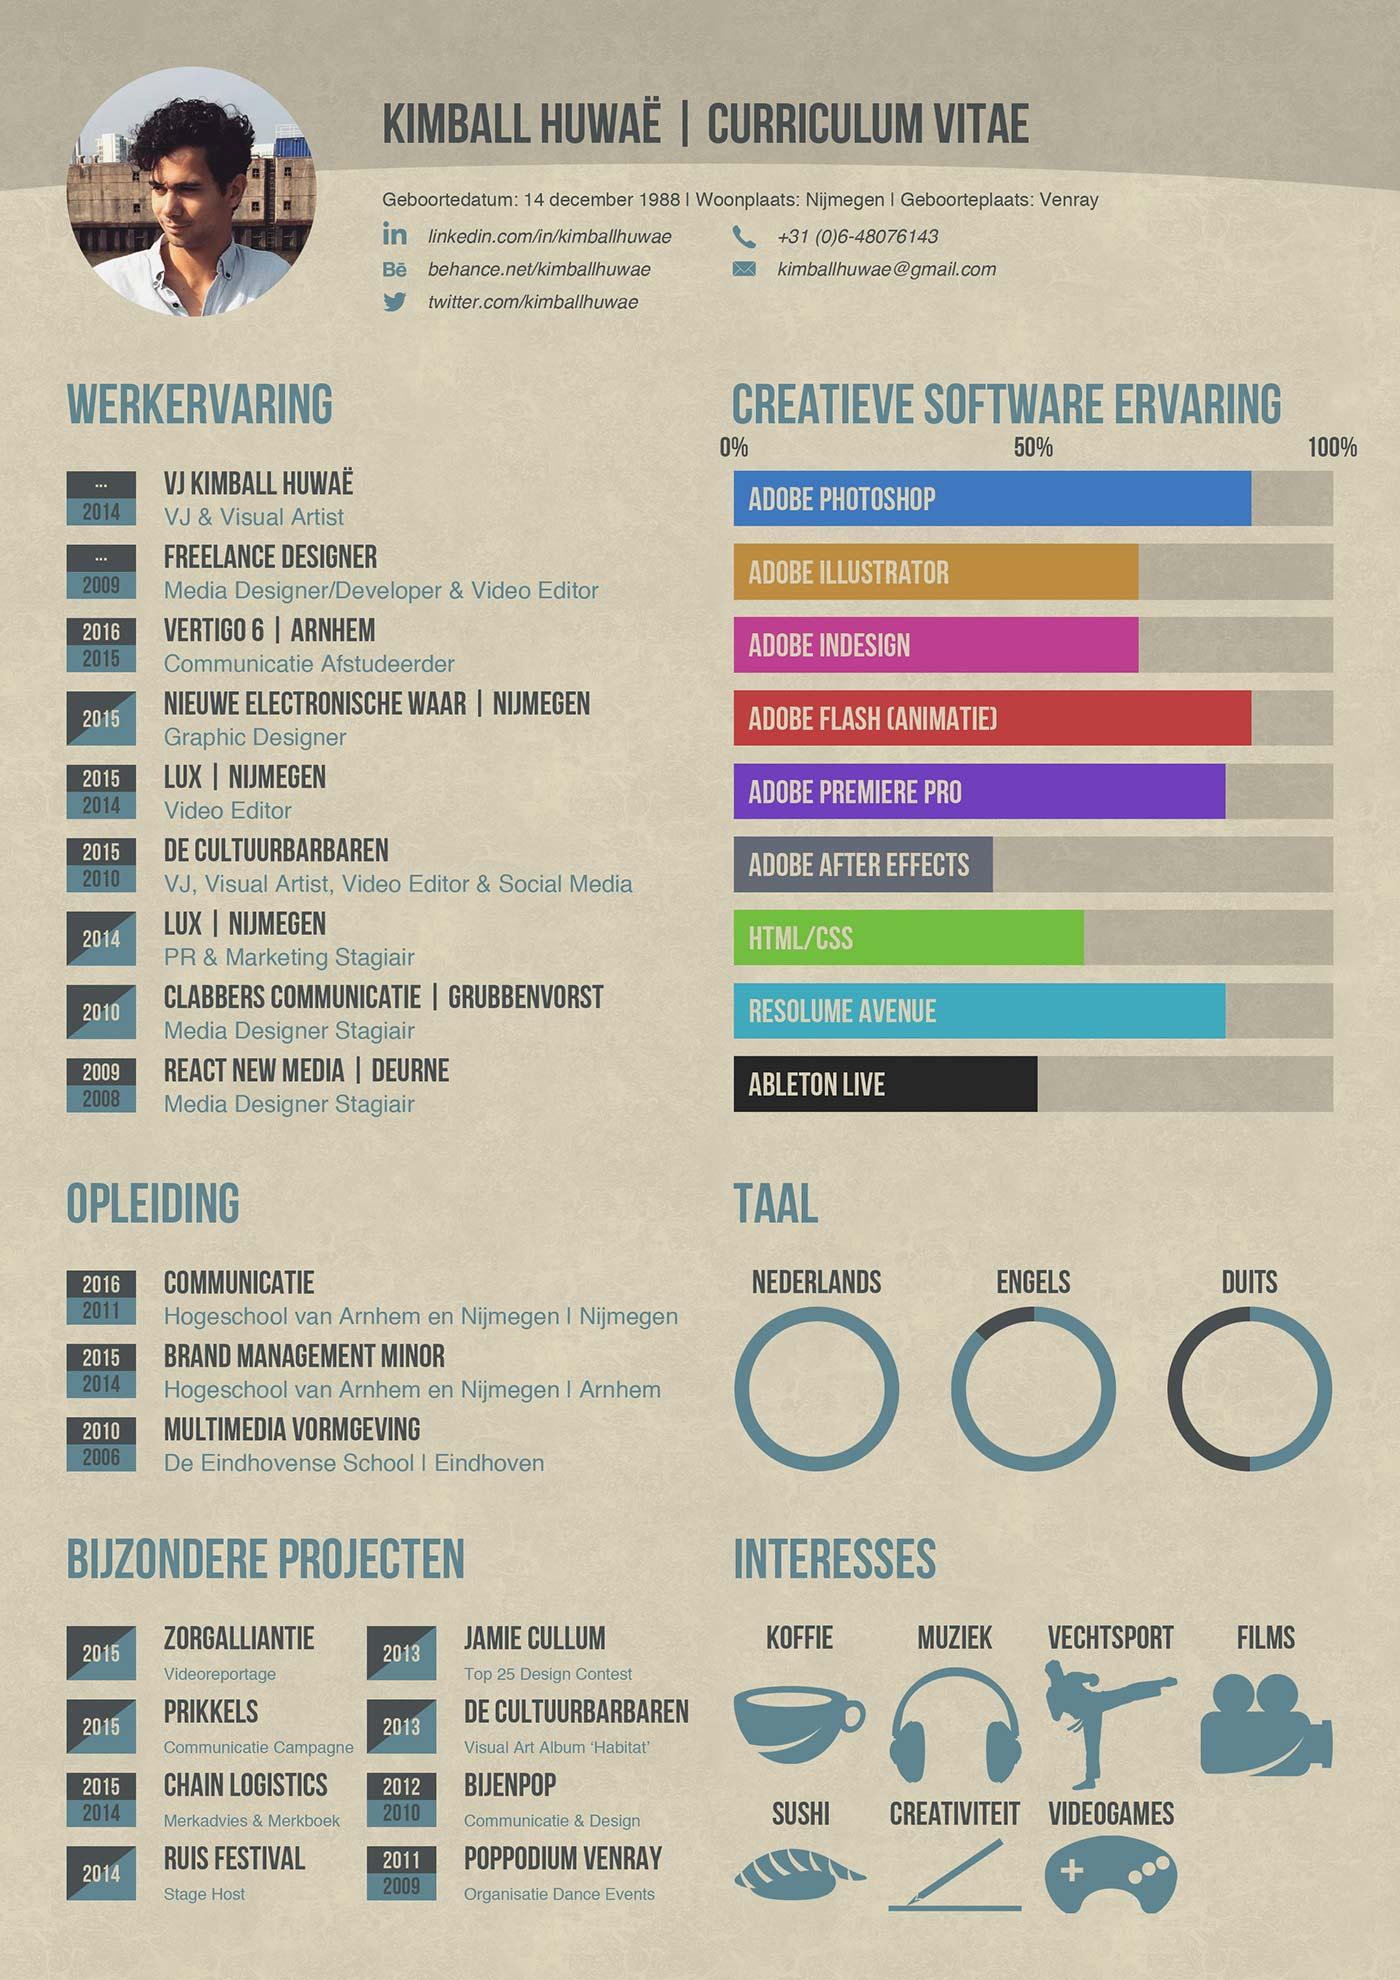 Infographic Hoe goed is jouw curriculum vitae